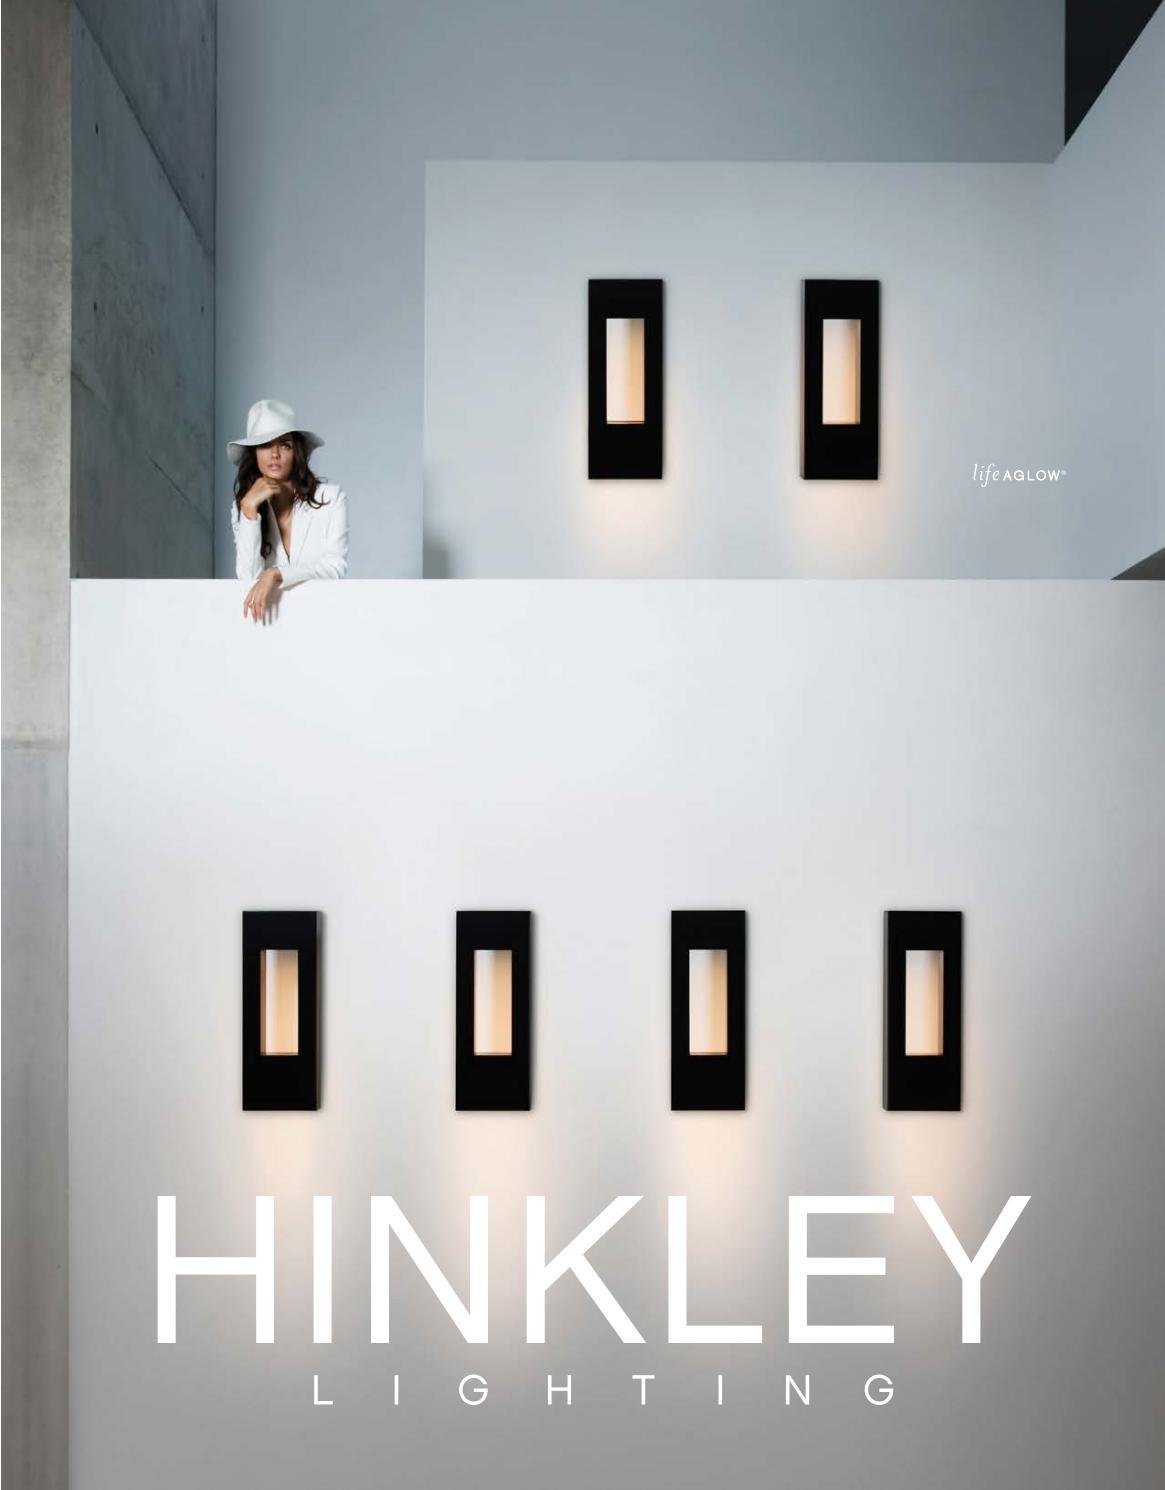 hinkley lighting january 2017 catalog